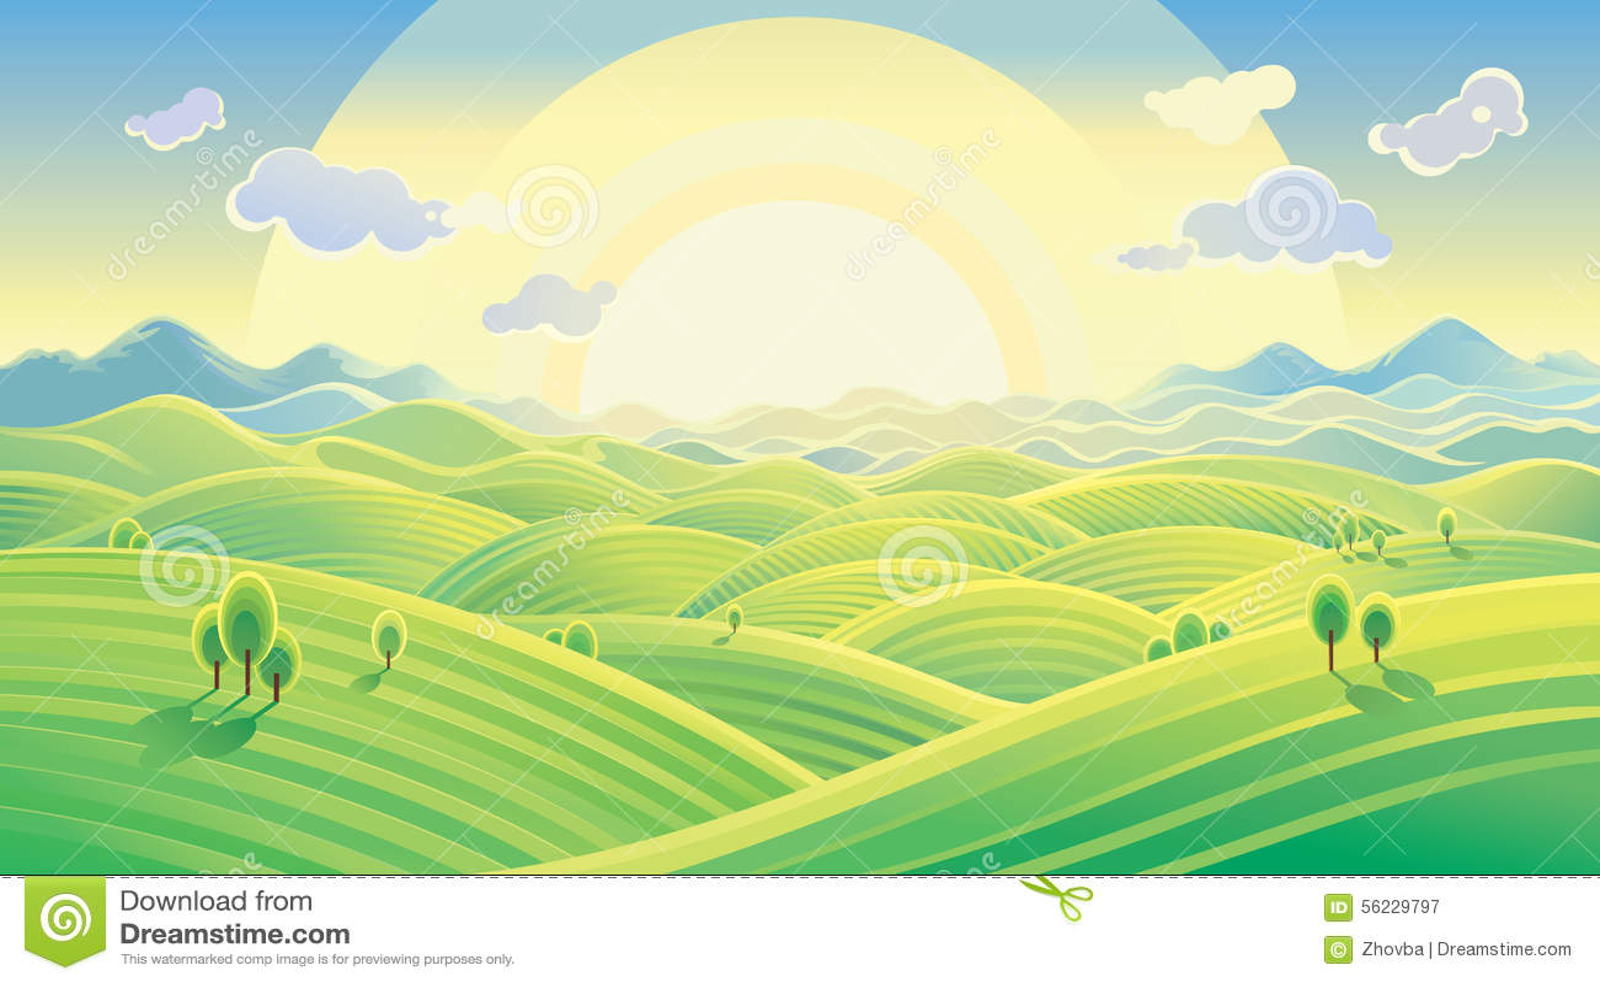 Sunny hilly landscape stock vector image 56229797 for Sunny landscape designs